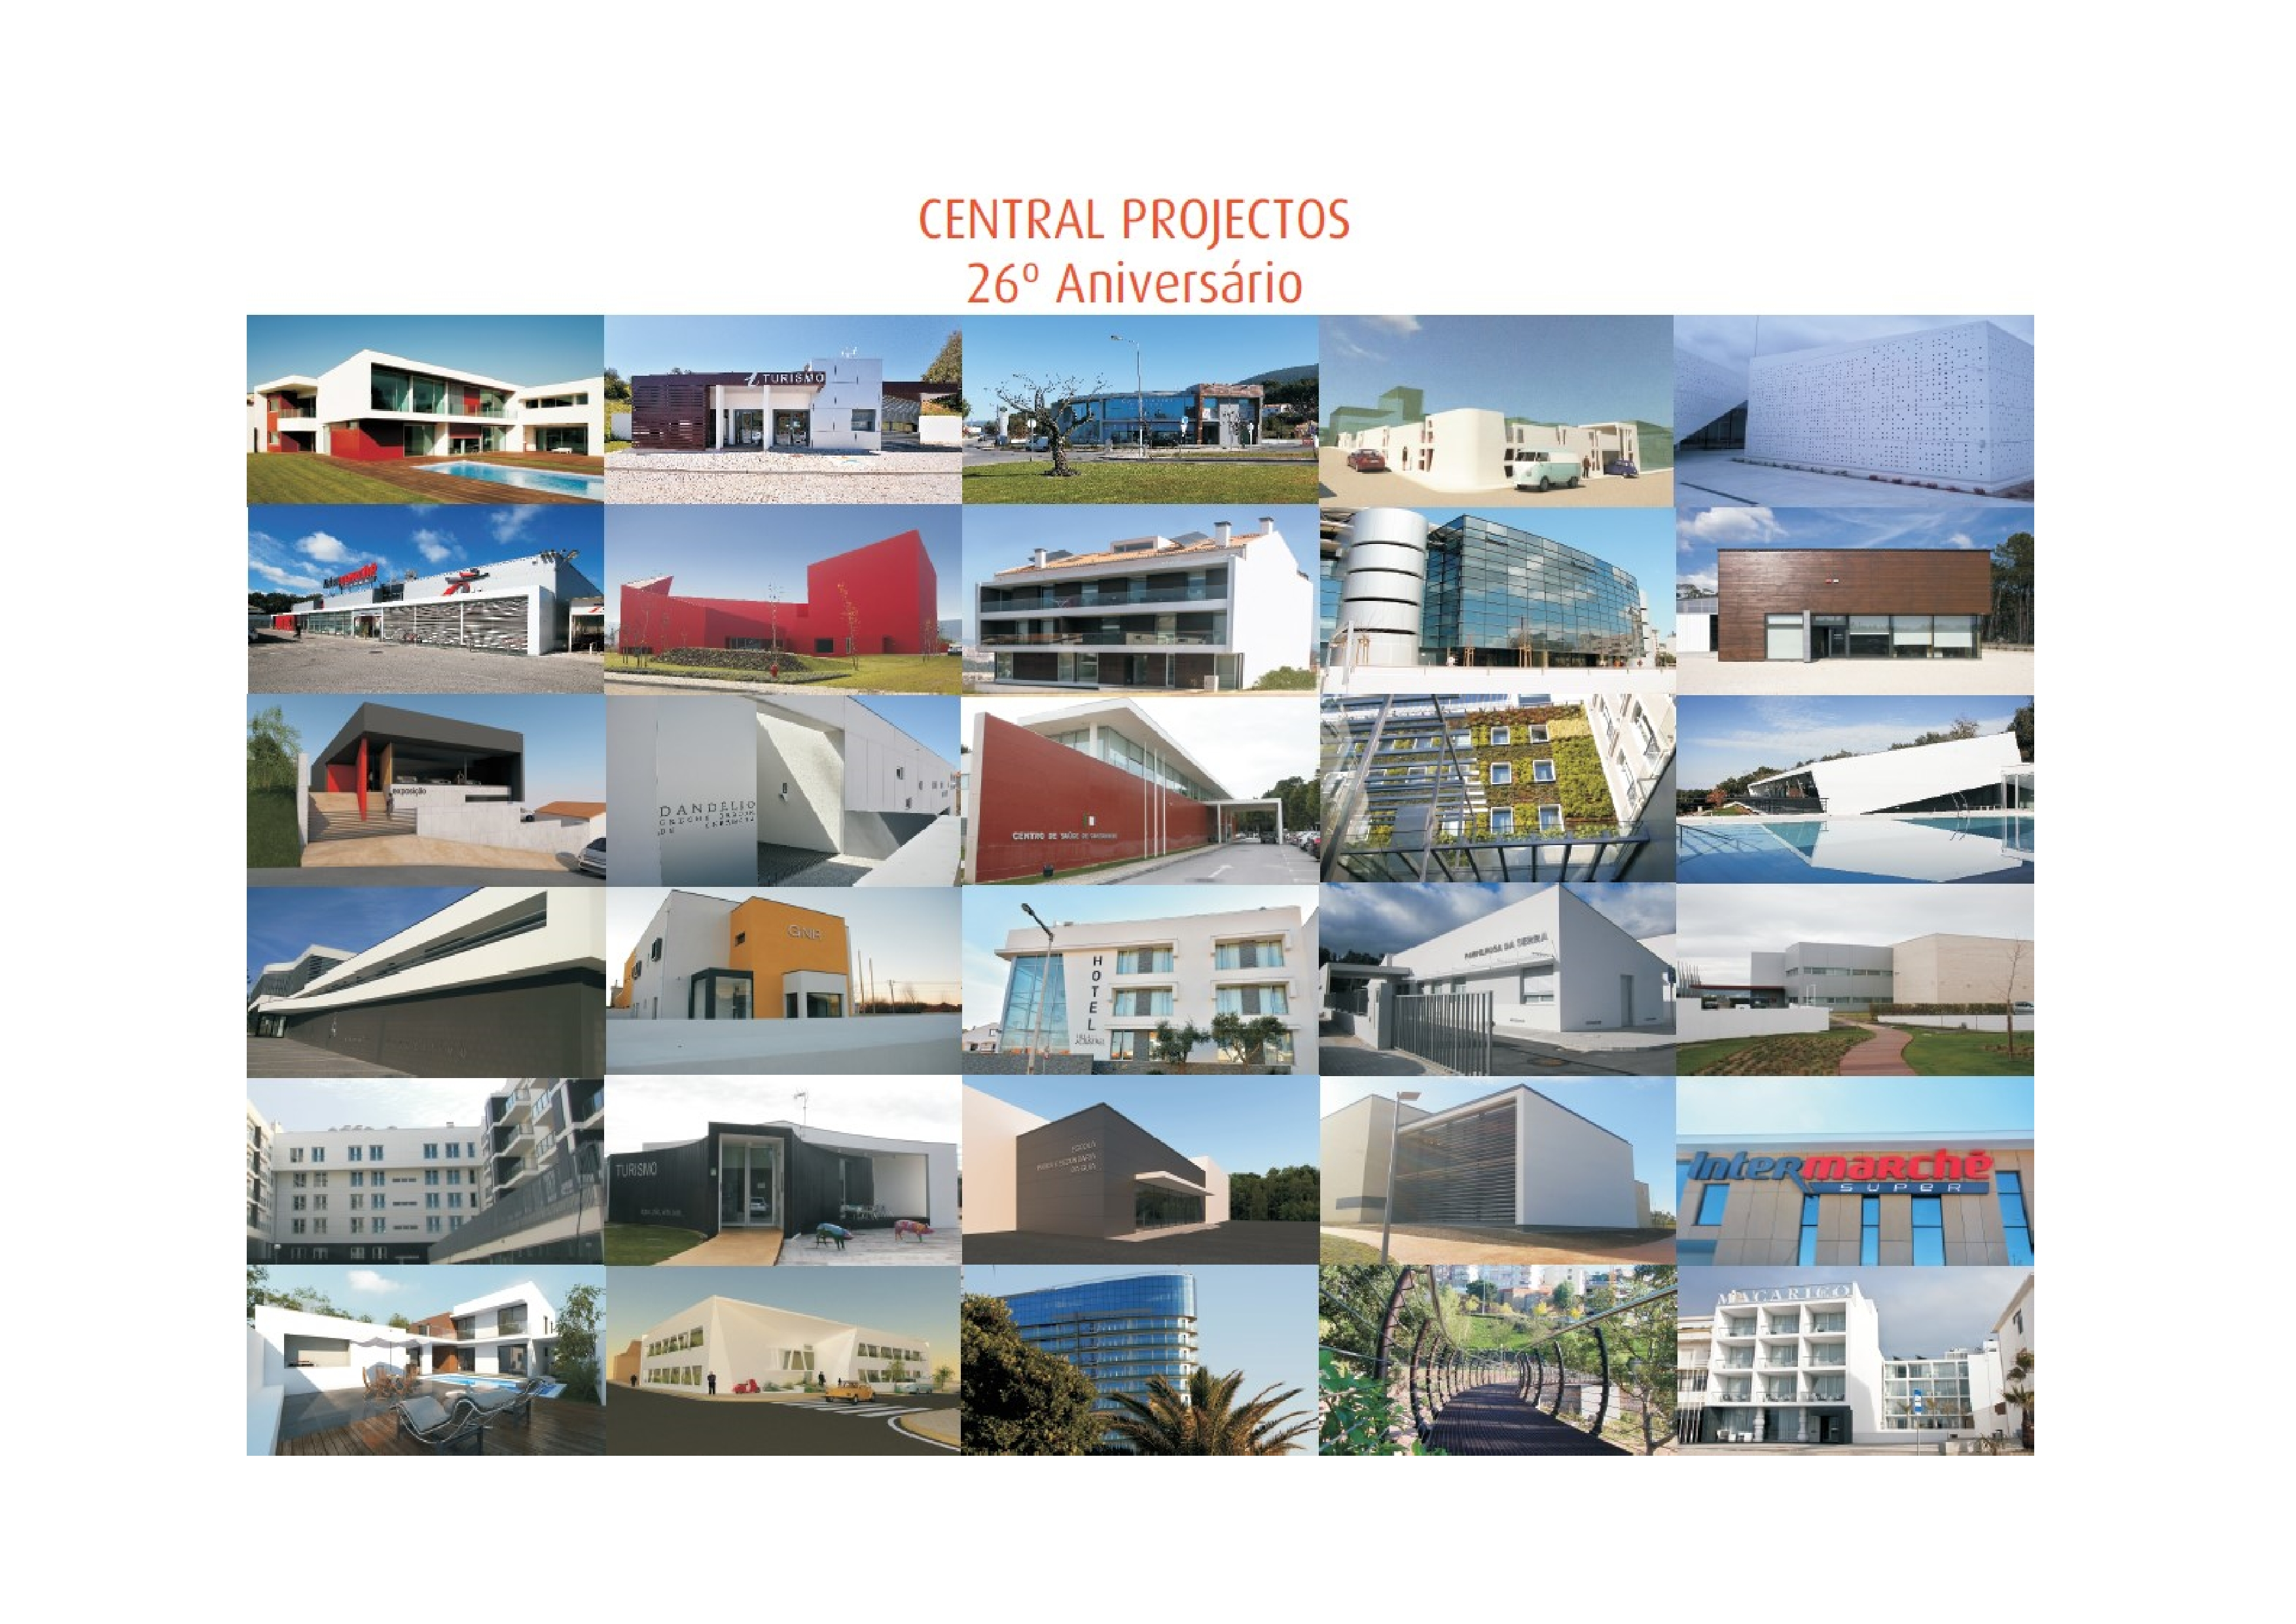 26º Aniversário da Central Projectos